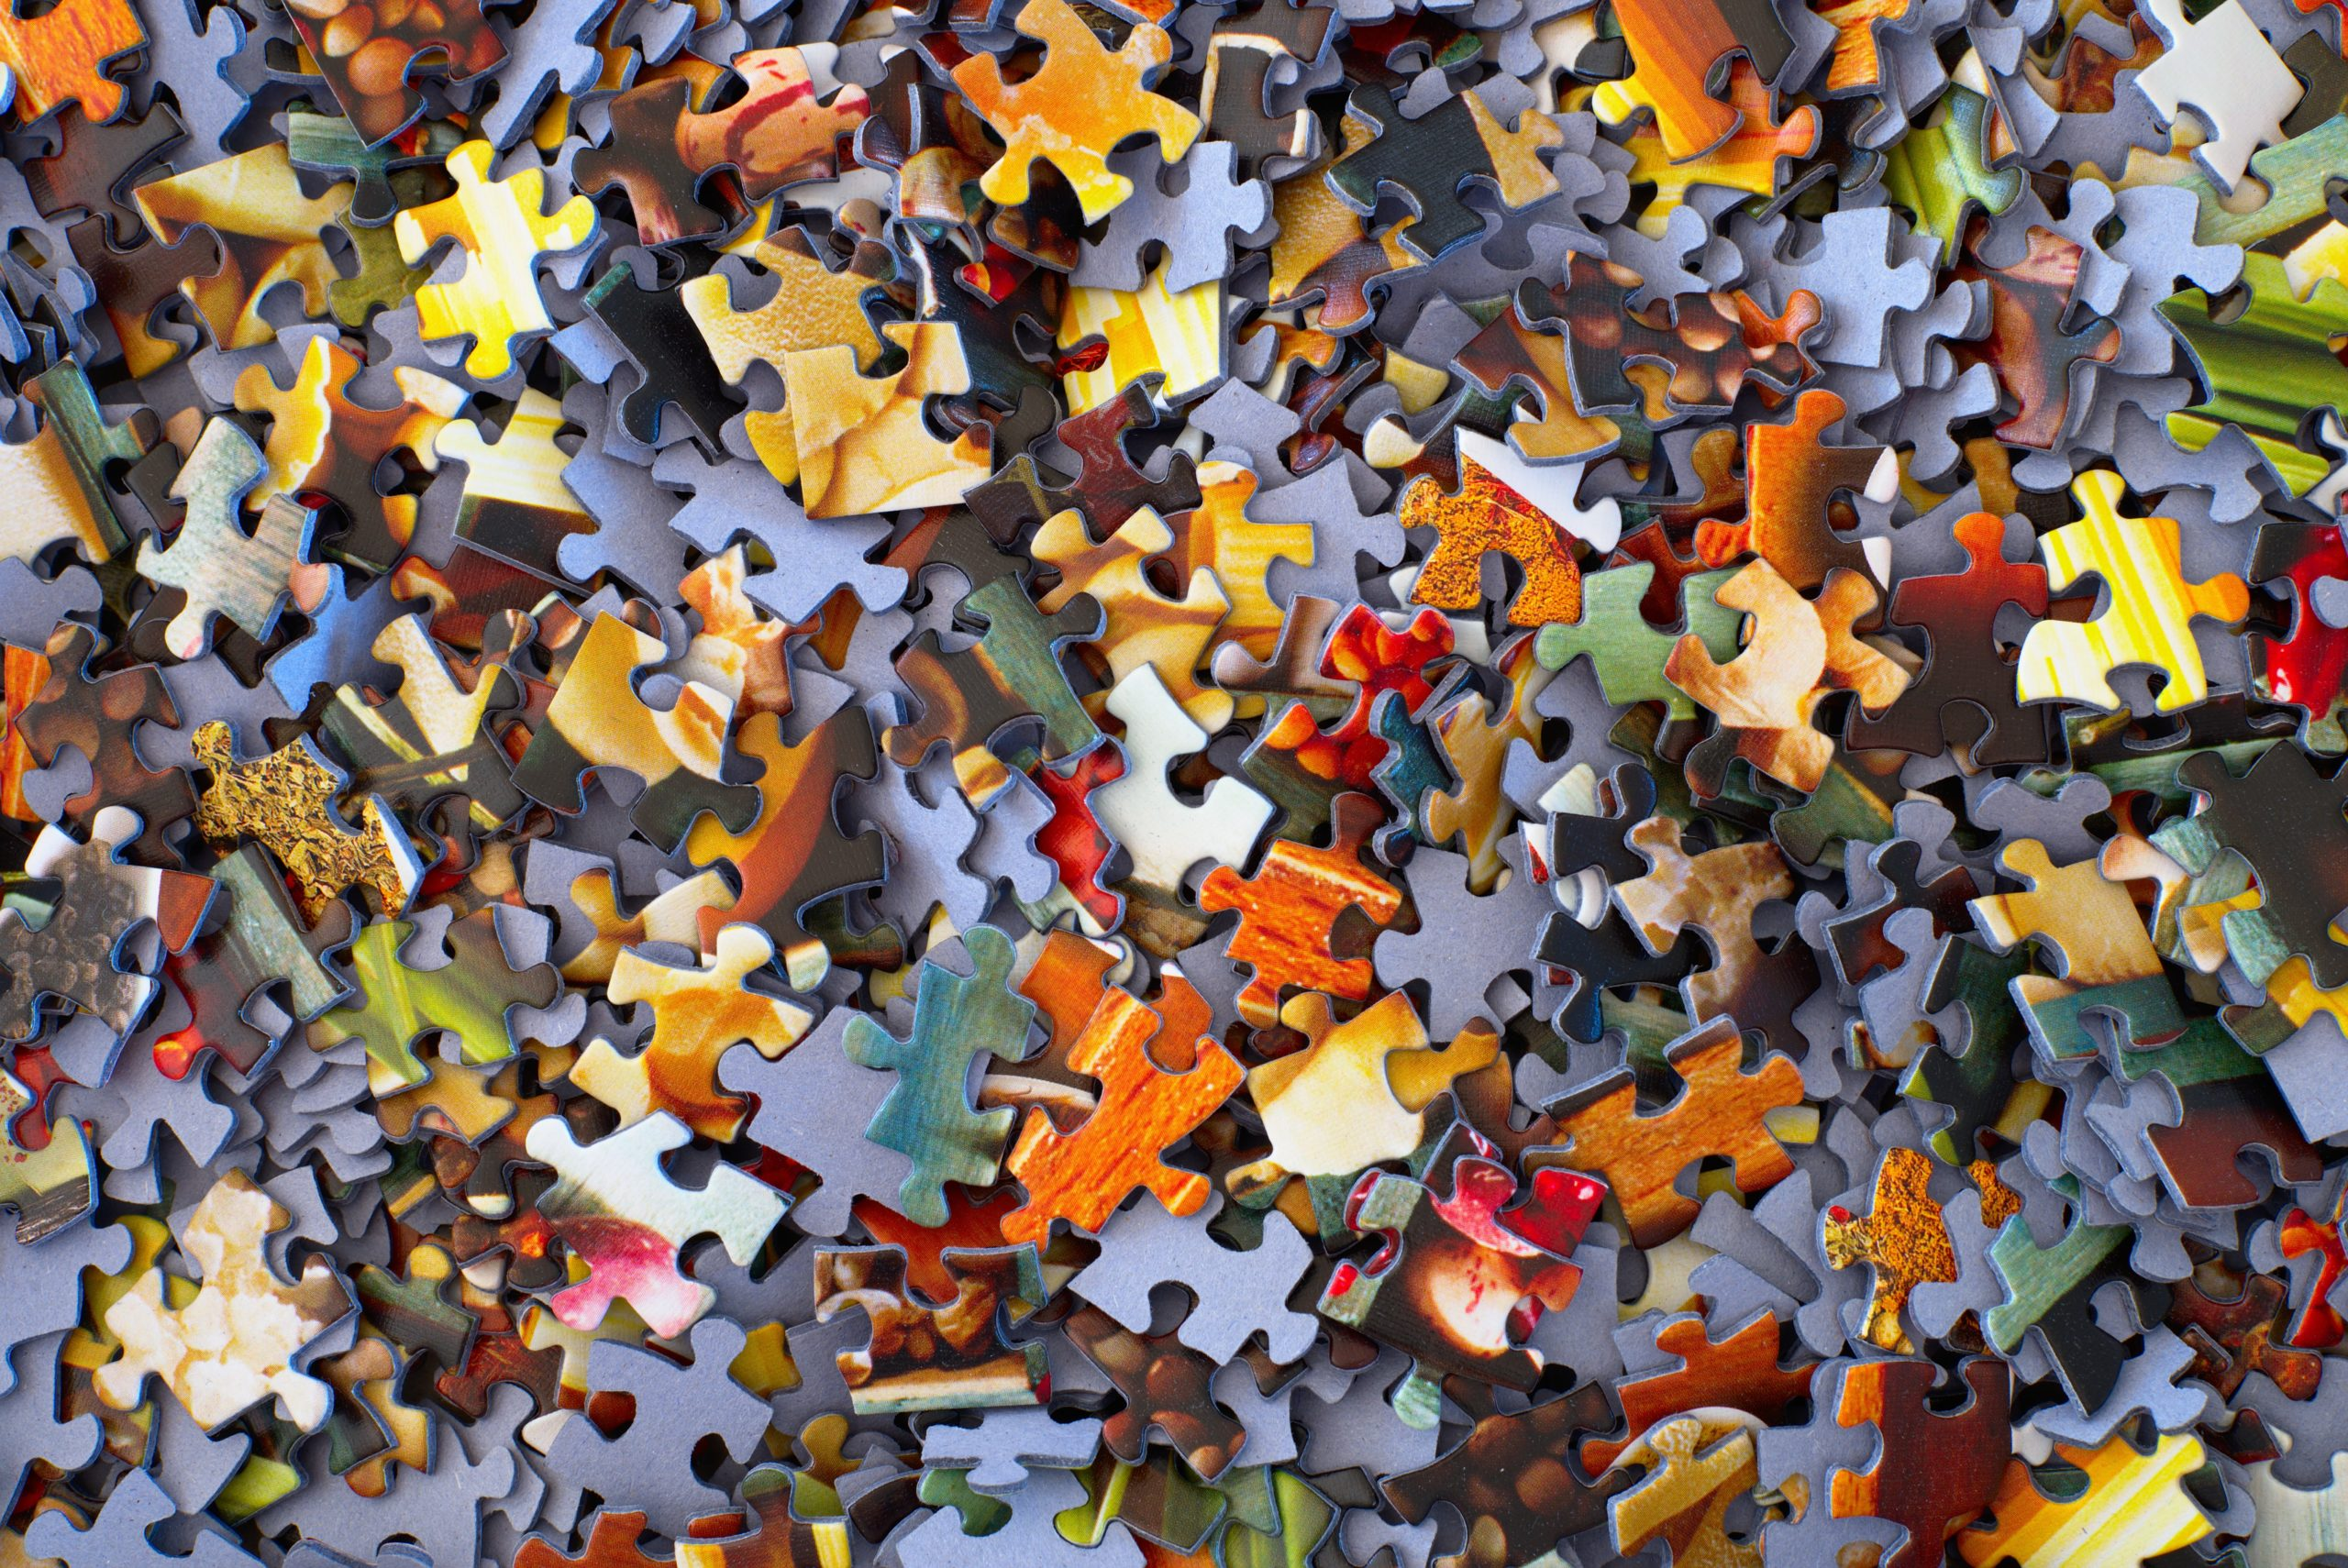 jigsaw - playfulness - Petros - good mental health